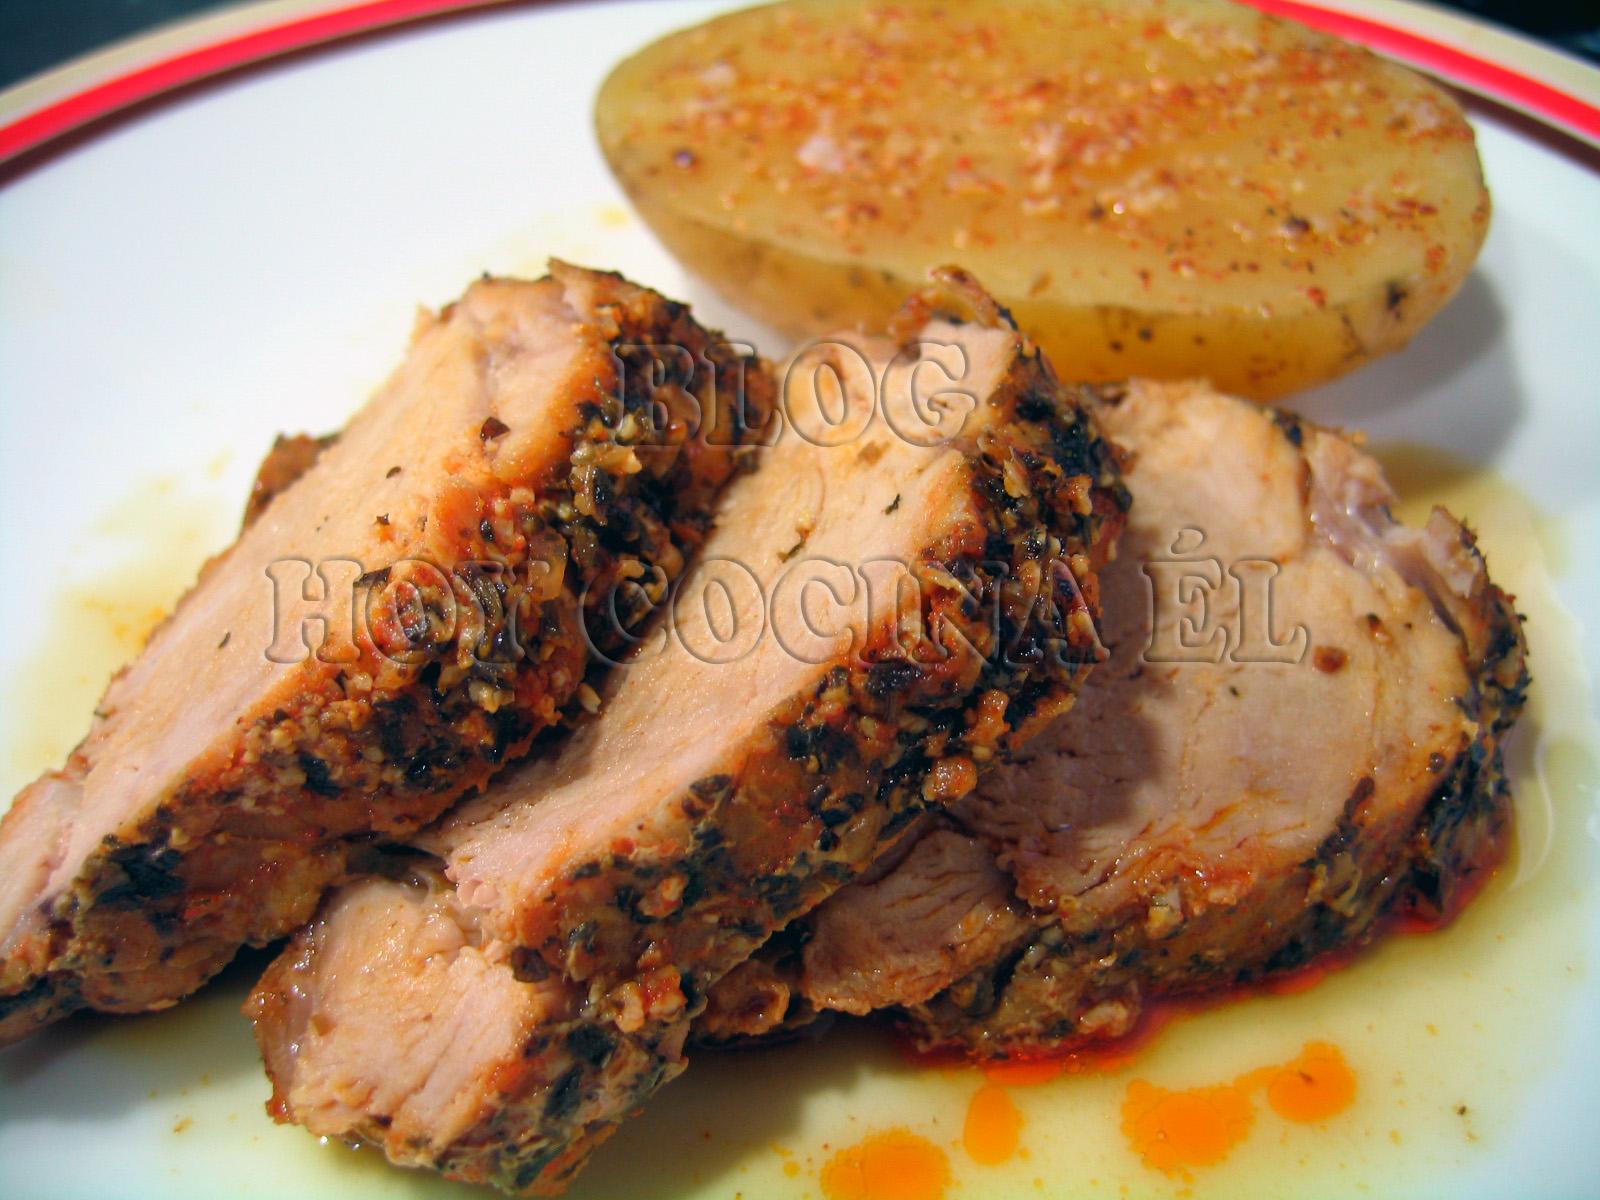 Image gallery solomillo - Solomillo de ternera al horno con mostaza ...